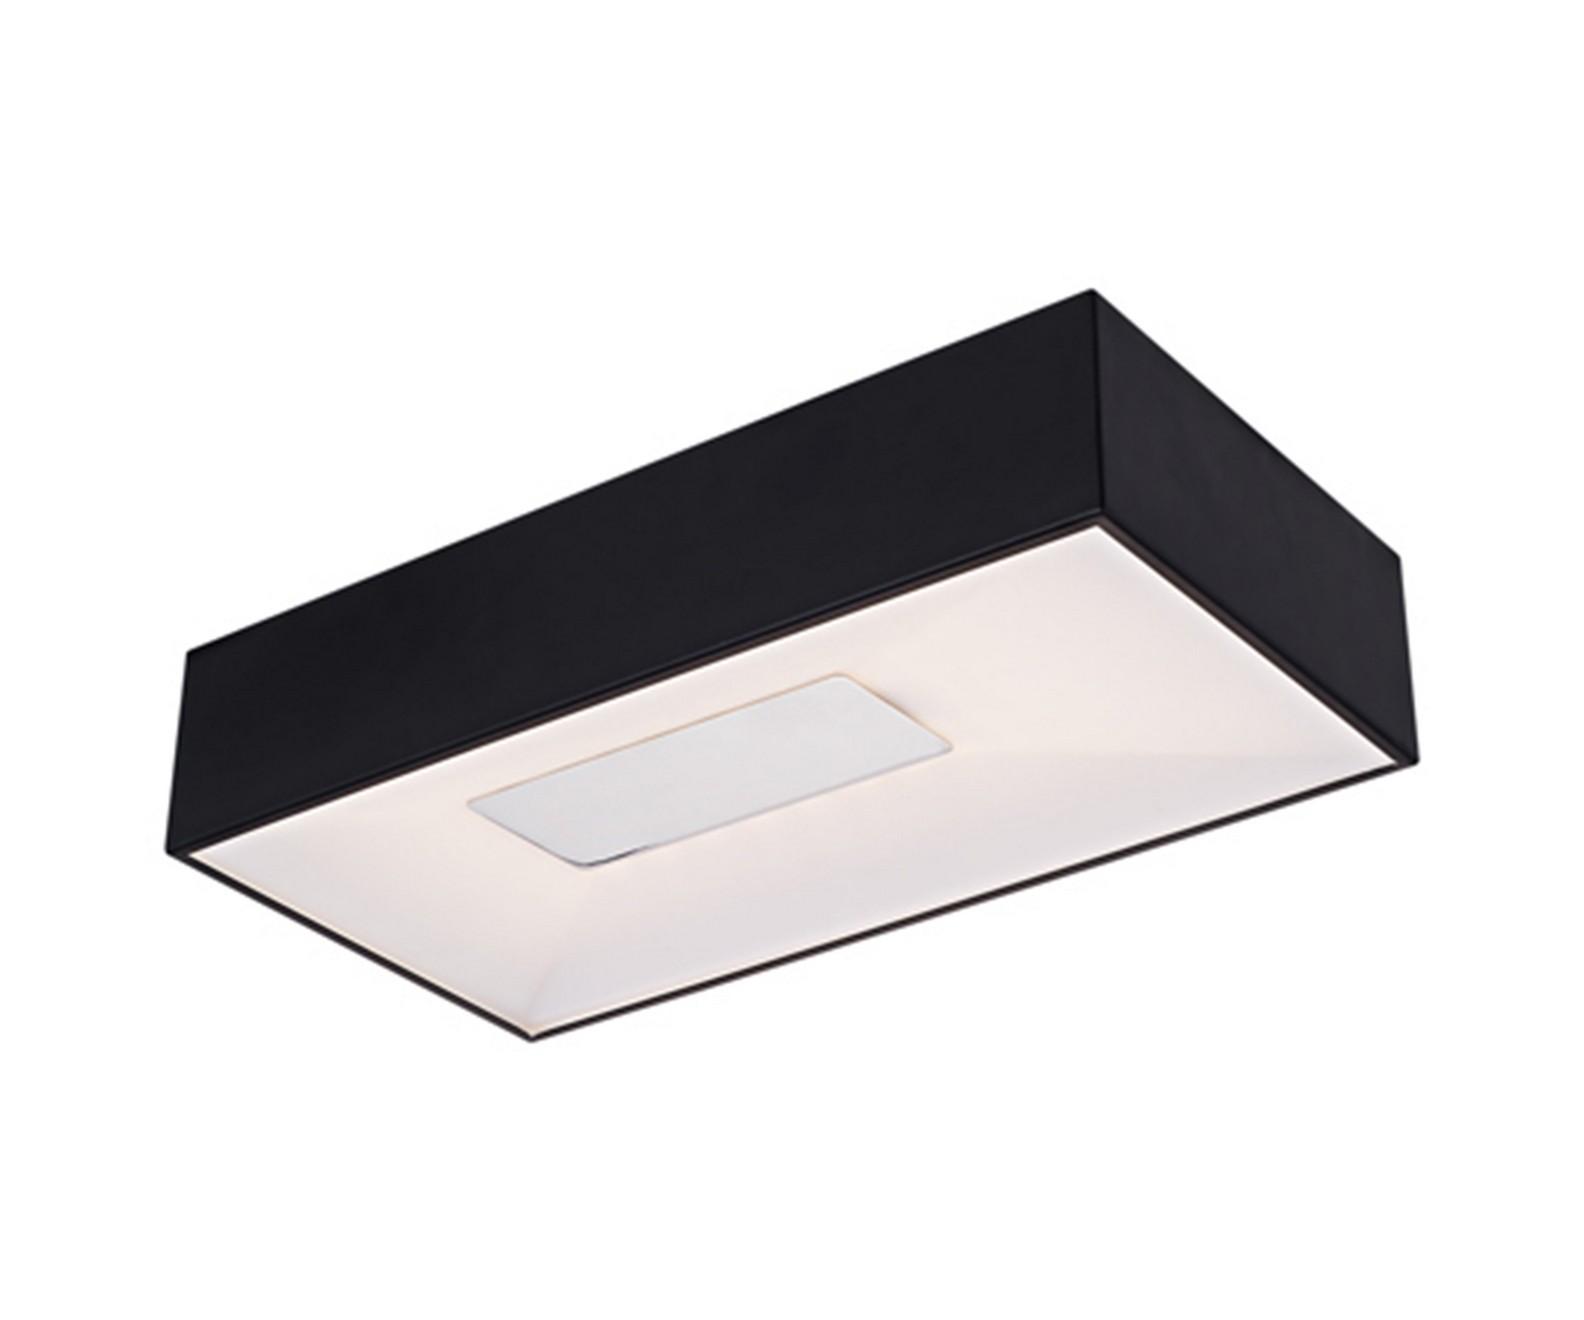 Потолочный светильник ТетрисПотолочные светильники<br>Вид цоколя: LED&amp;lt;div&amp;gt;Мощность лампы: 20W&amp;lt;/div&amp;gt;&amp;lt;div&amp;gt;Количество ламп: 1&amp;lt;/div&amp;gt;<br><br>Material: Металл<br>Width см: 45<br>Depth см: 23,5<br>Height см: 10